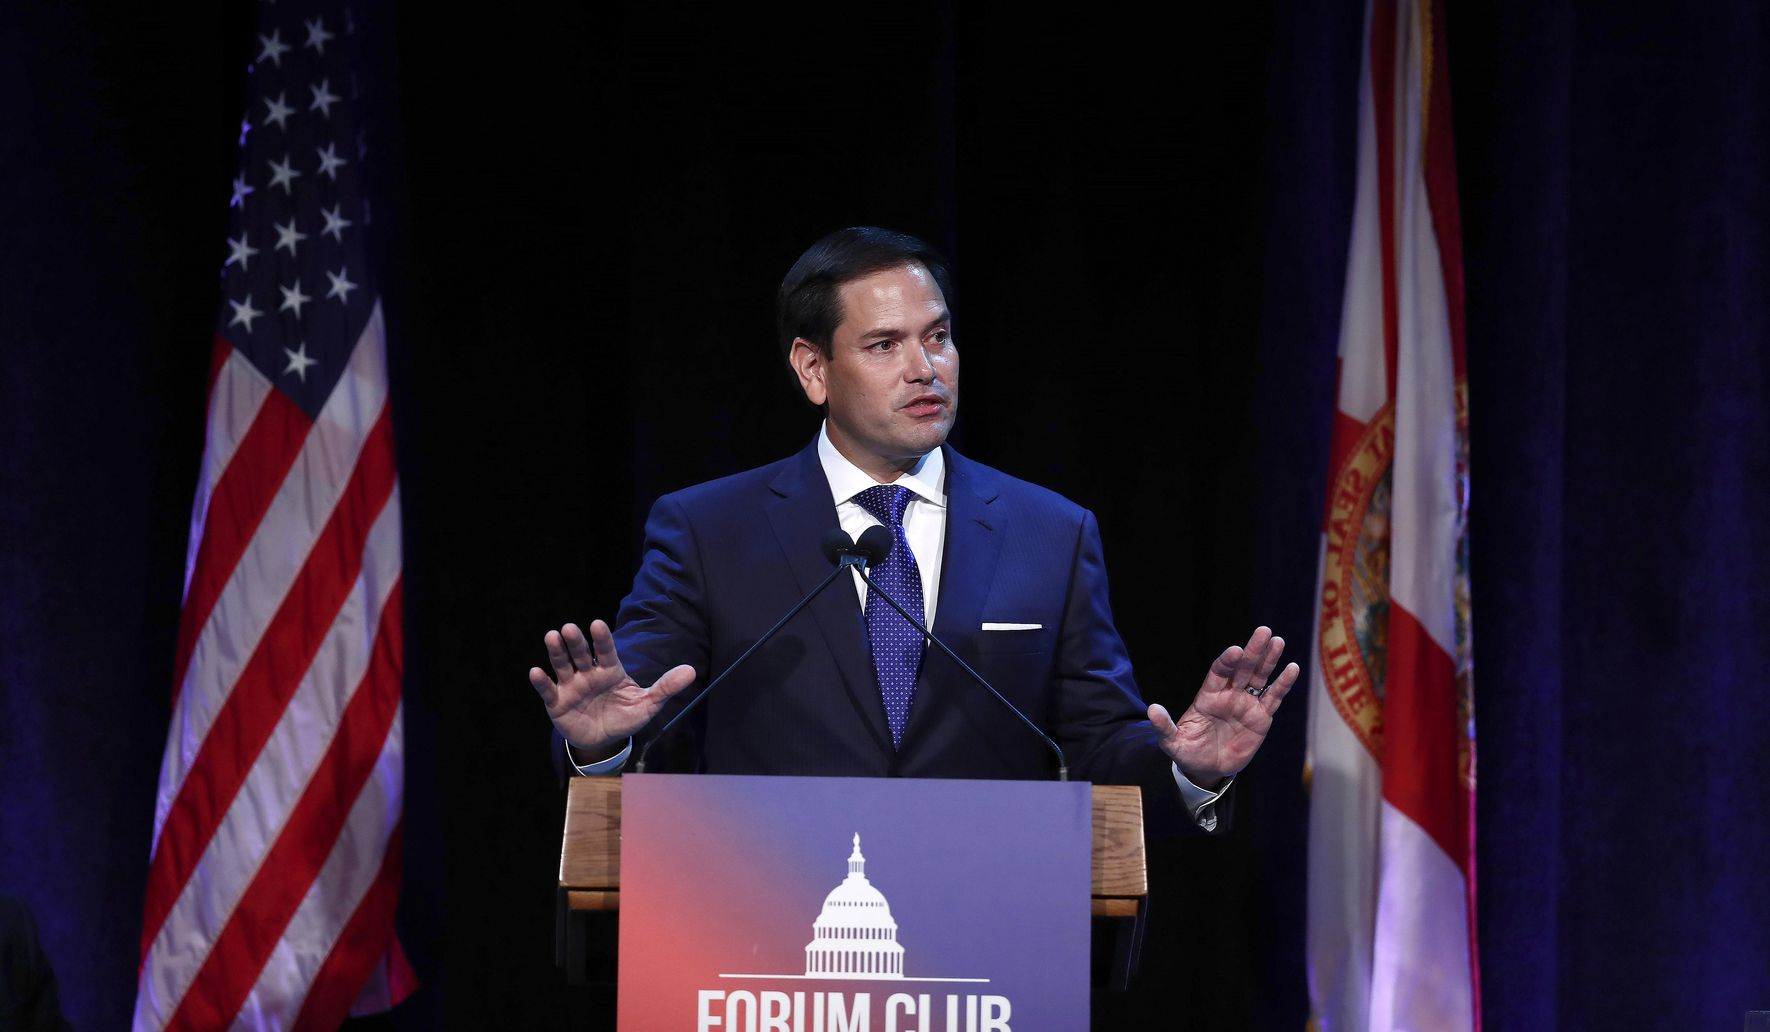 Marco Rubio calls for compromise, bipartisanship in politics